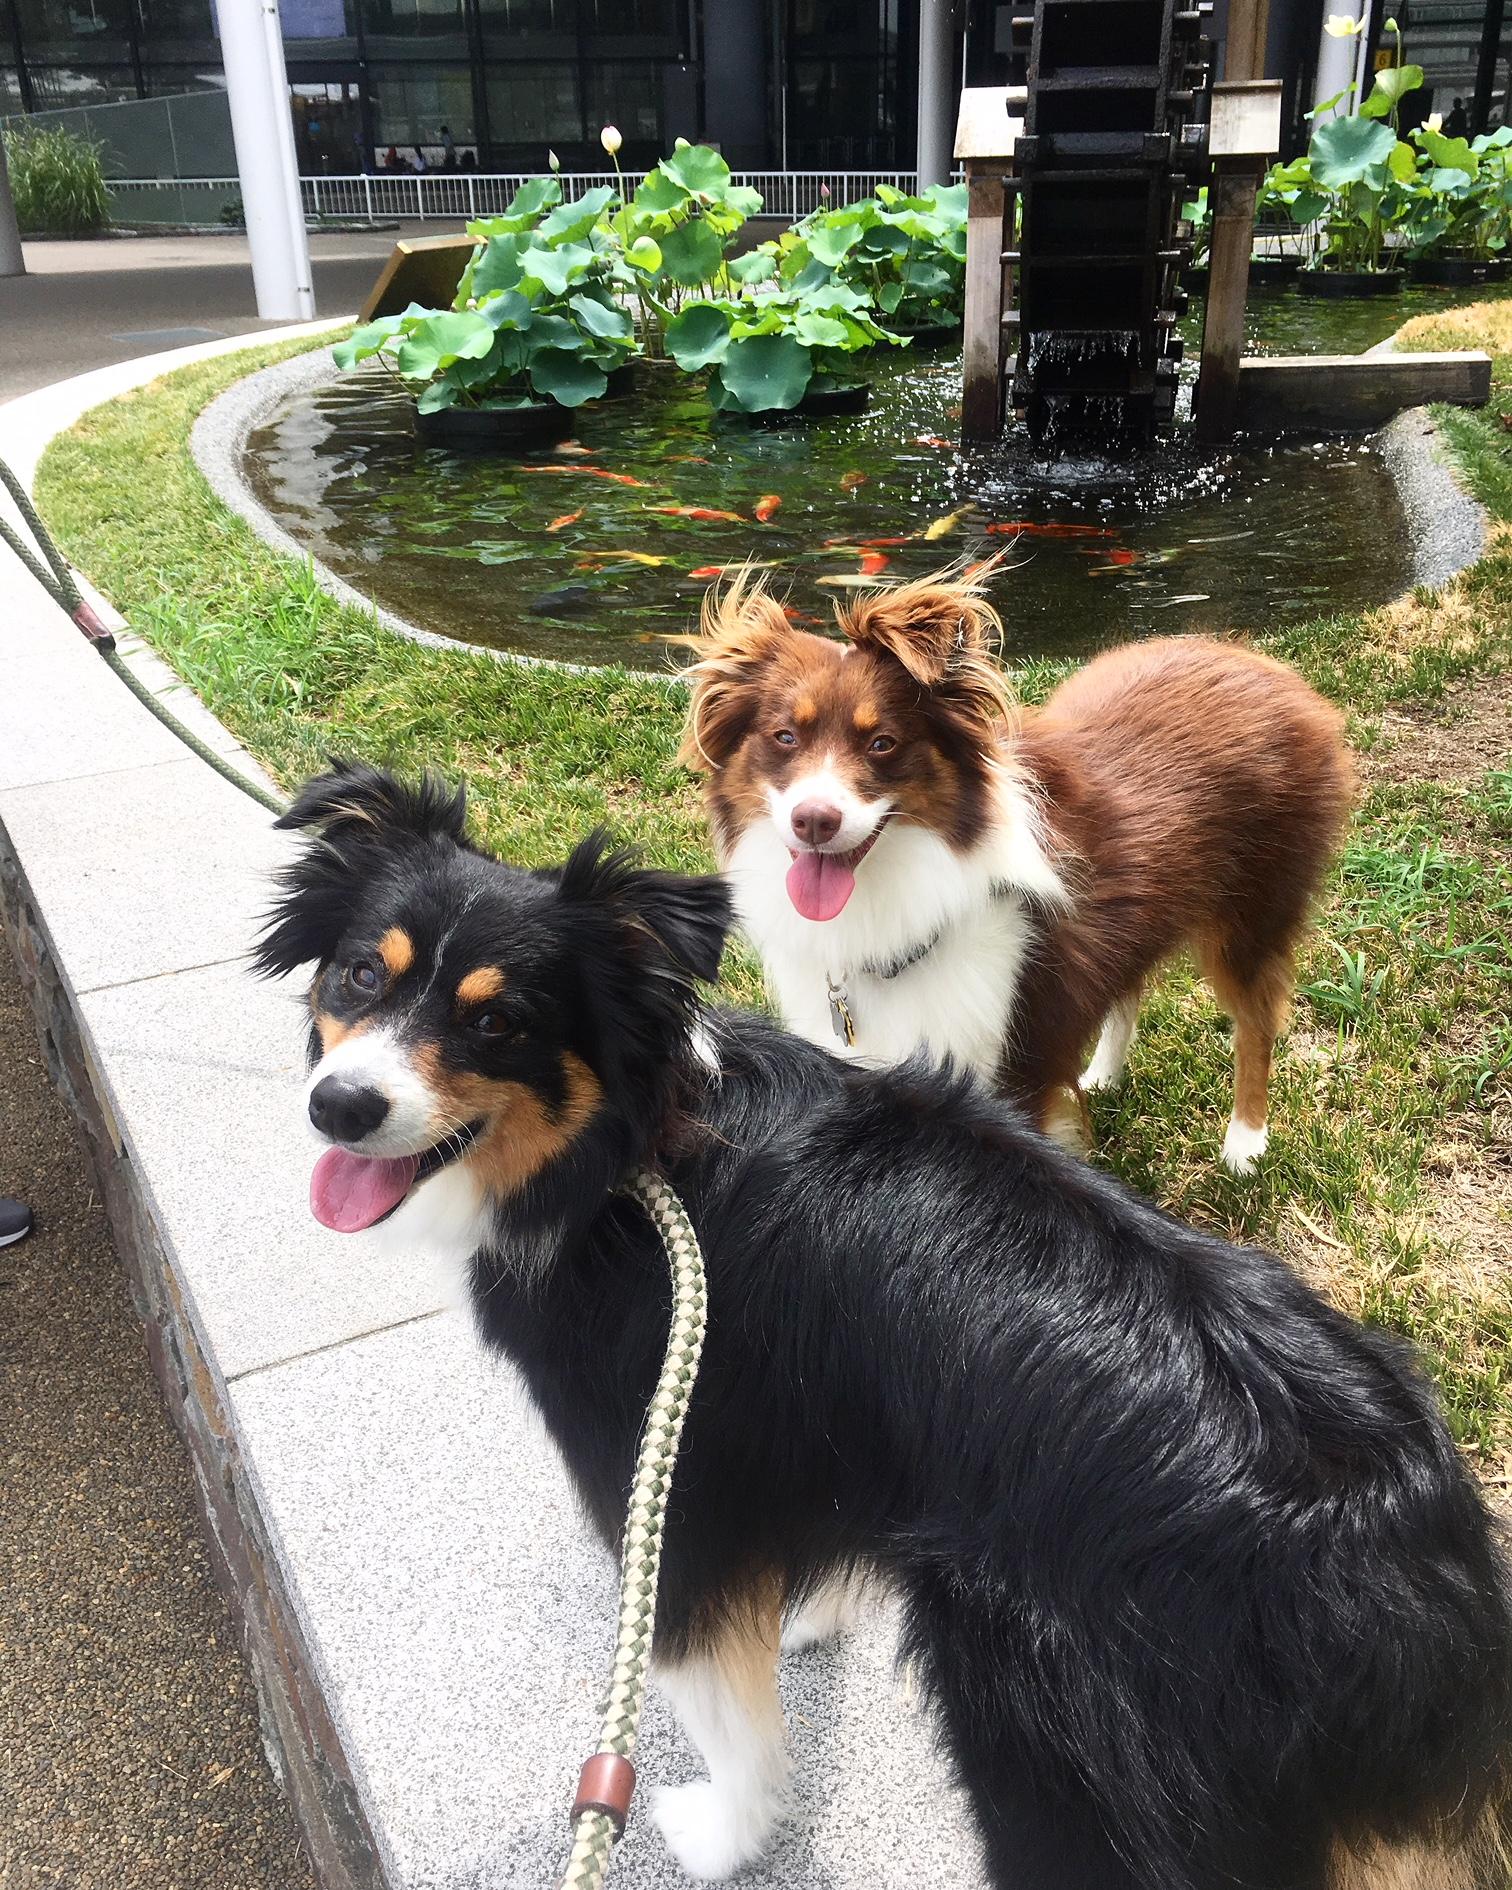 Pet travel in Japan Monroe Tales Schuyler Croy